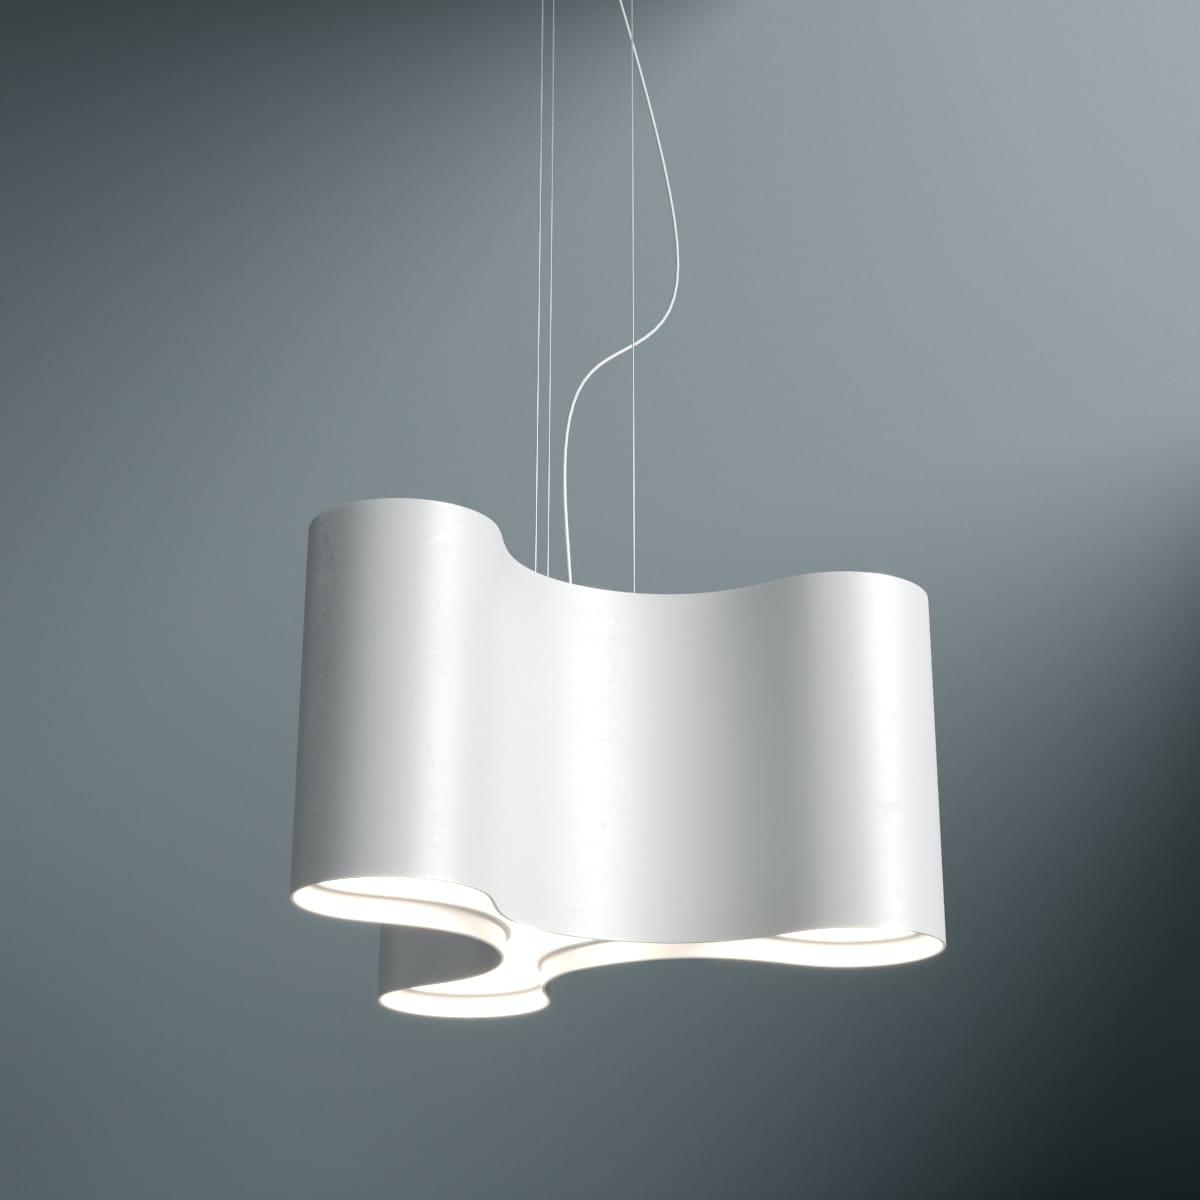 lamp 48 AM247